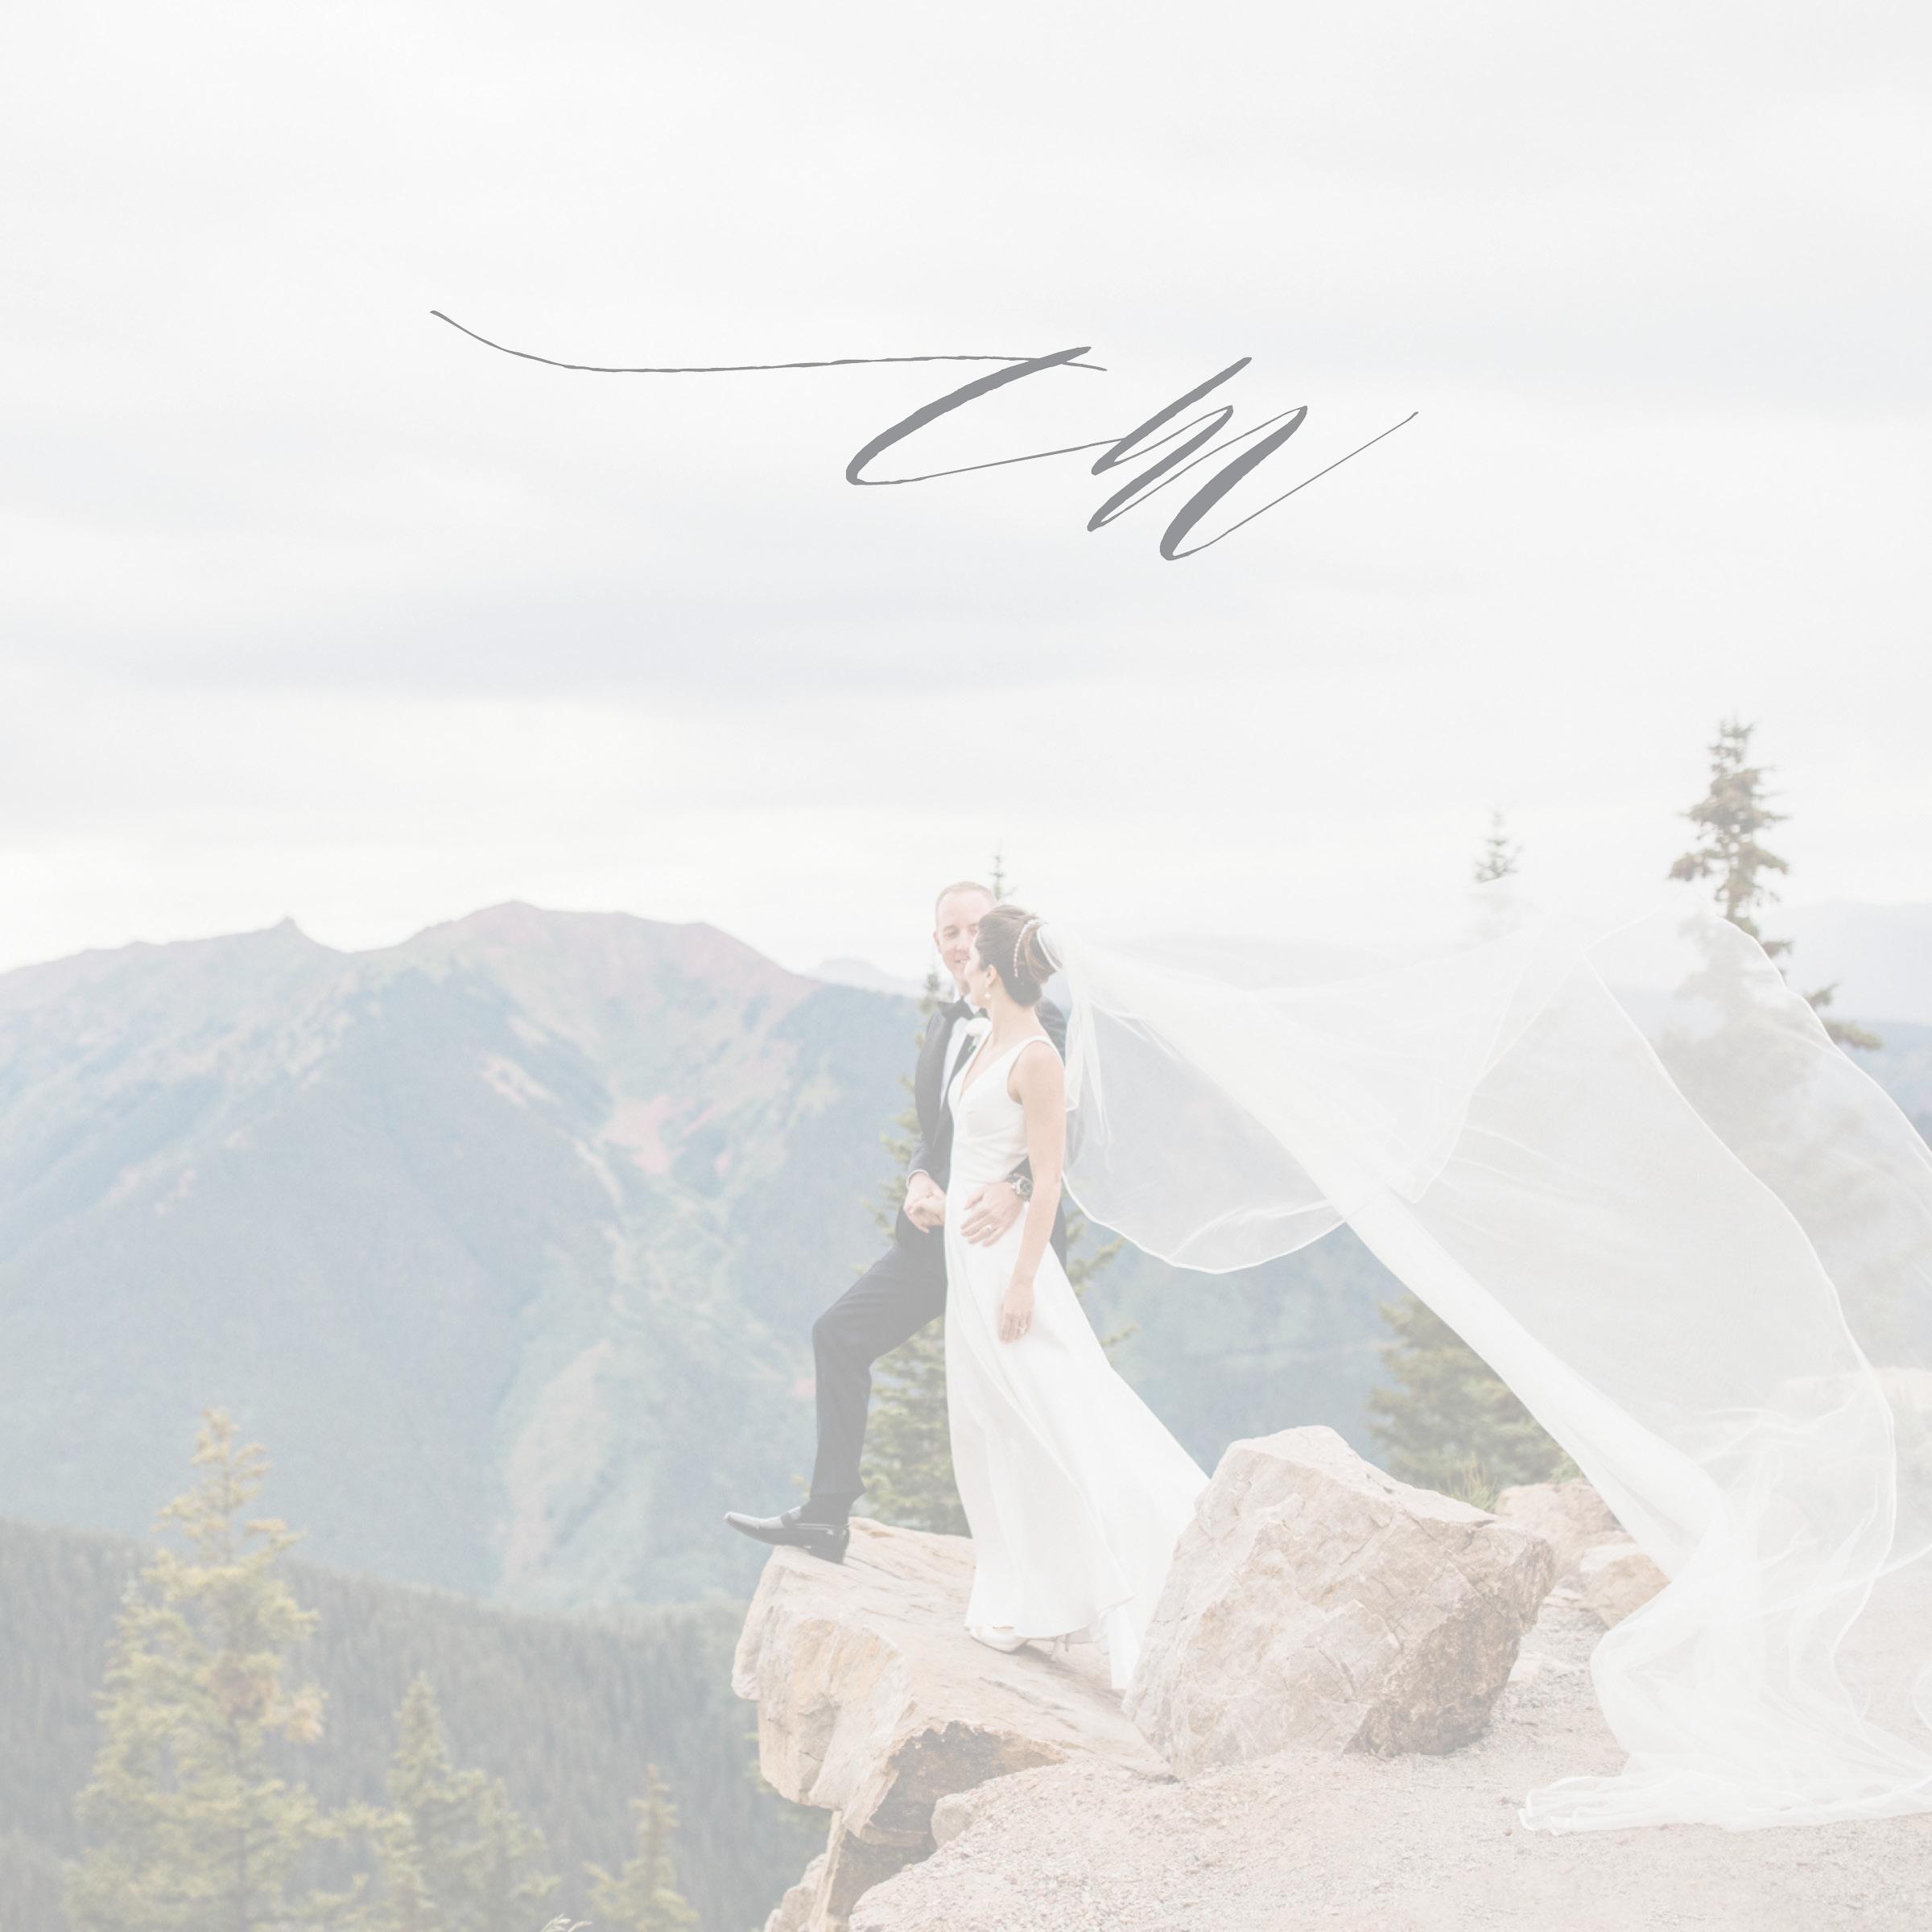 Tara_Script Brandmark on Wedding Photo.jpg